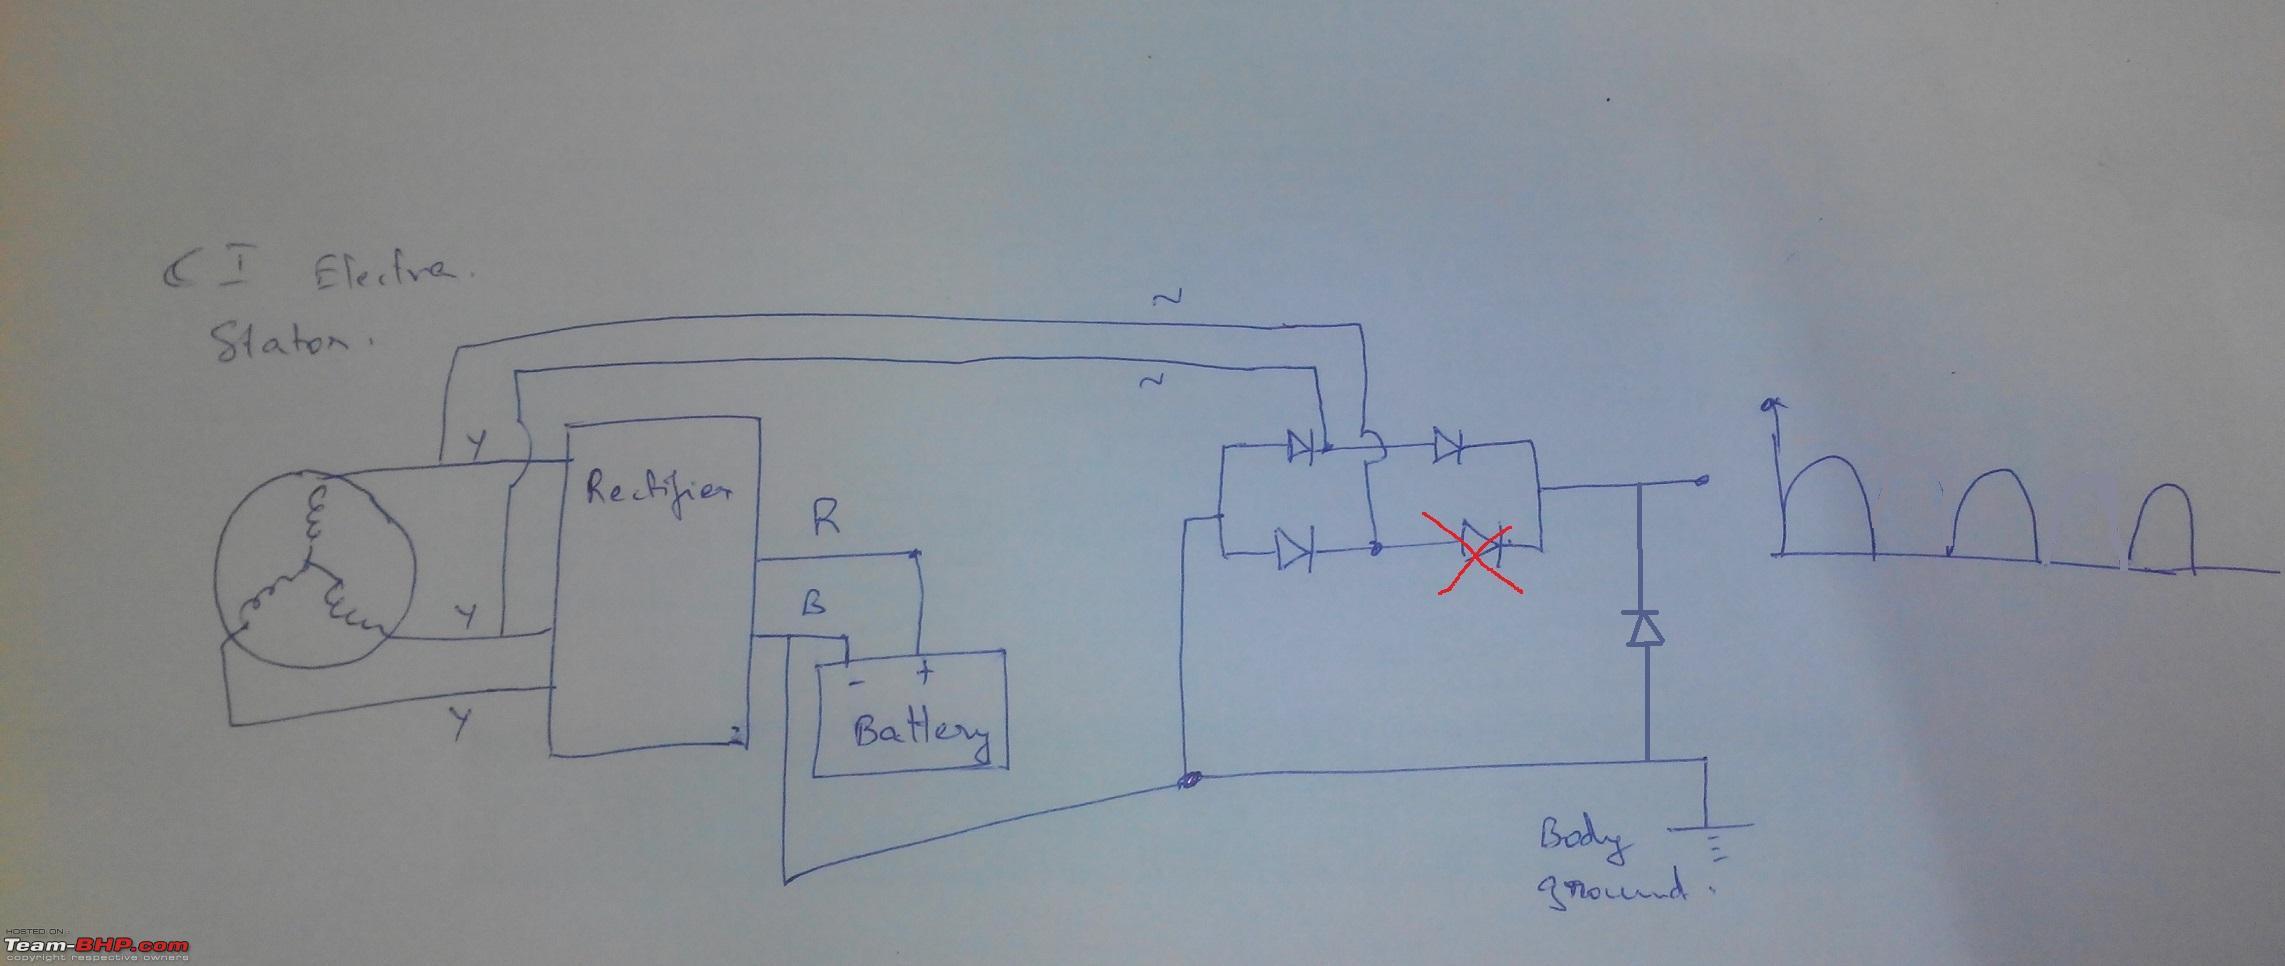 GG_5368] 1956 Indian Royal Enfield Wiring Diagram Schematic WiringHroni Rosz Rect Omit Kargi Hone Puti Ixtu Nowa Orsal Emba Mohammedshrine  Librar Wiring 101